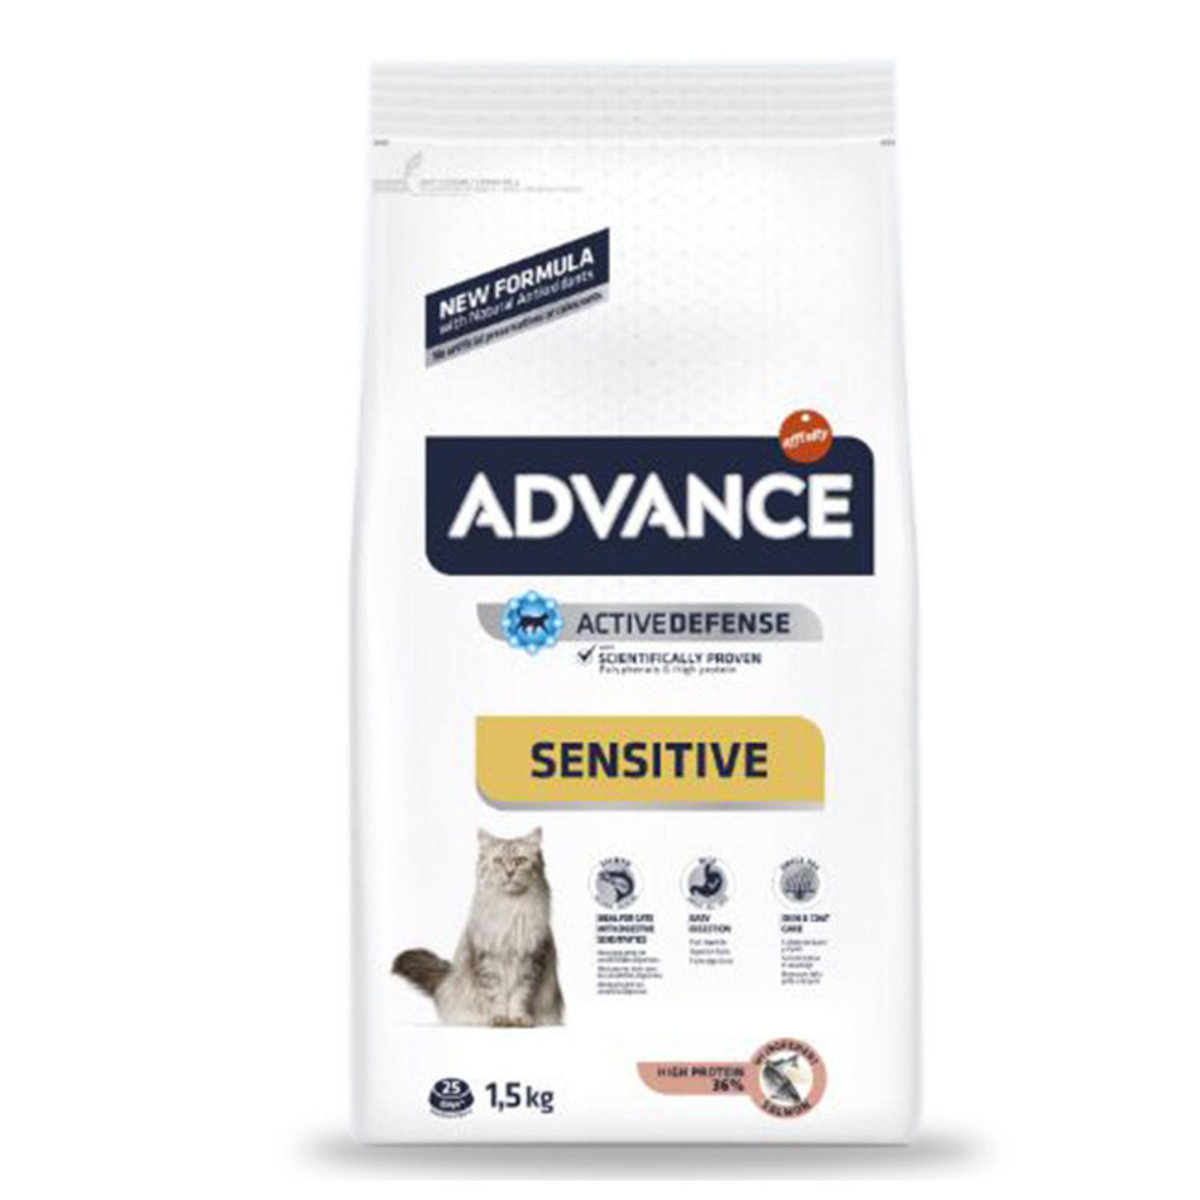 Advabce Activedefense Sensitve